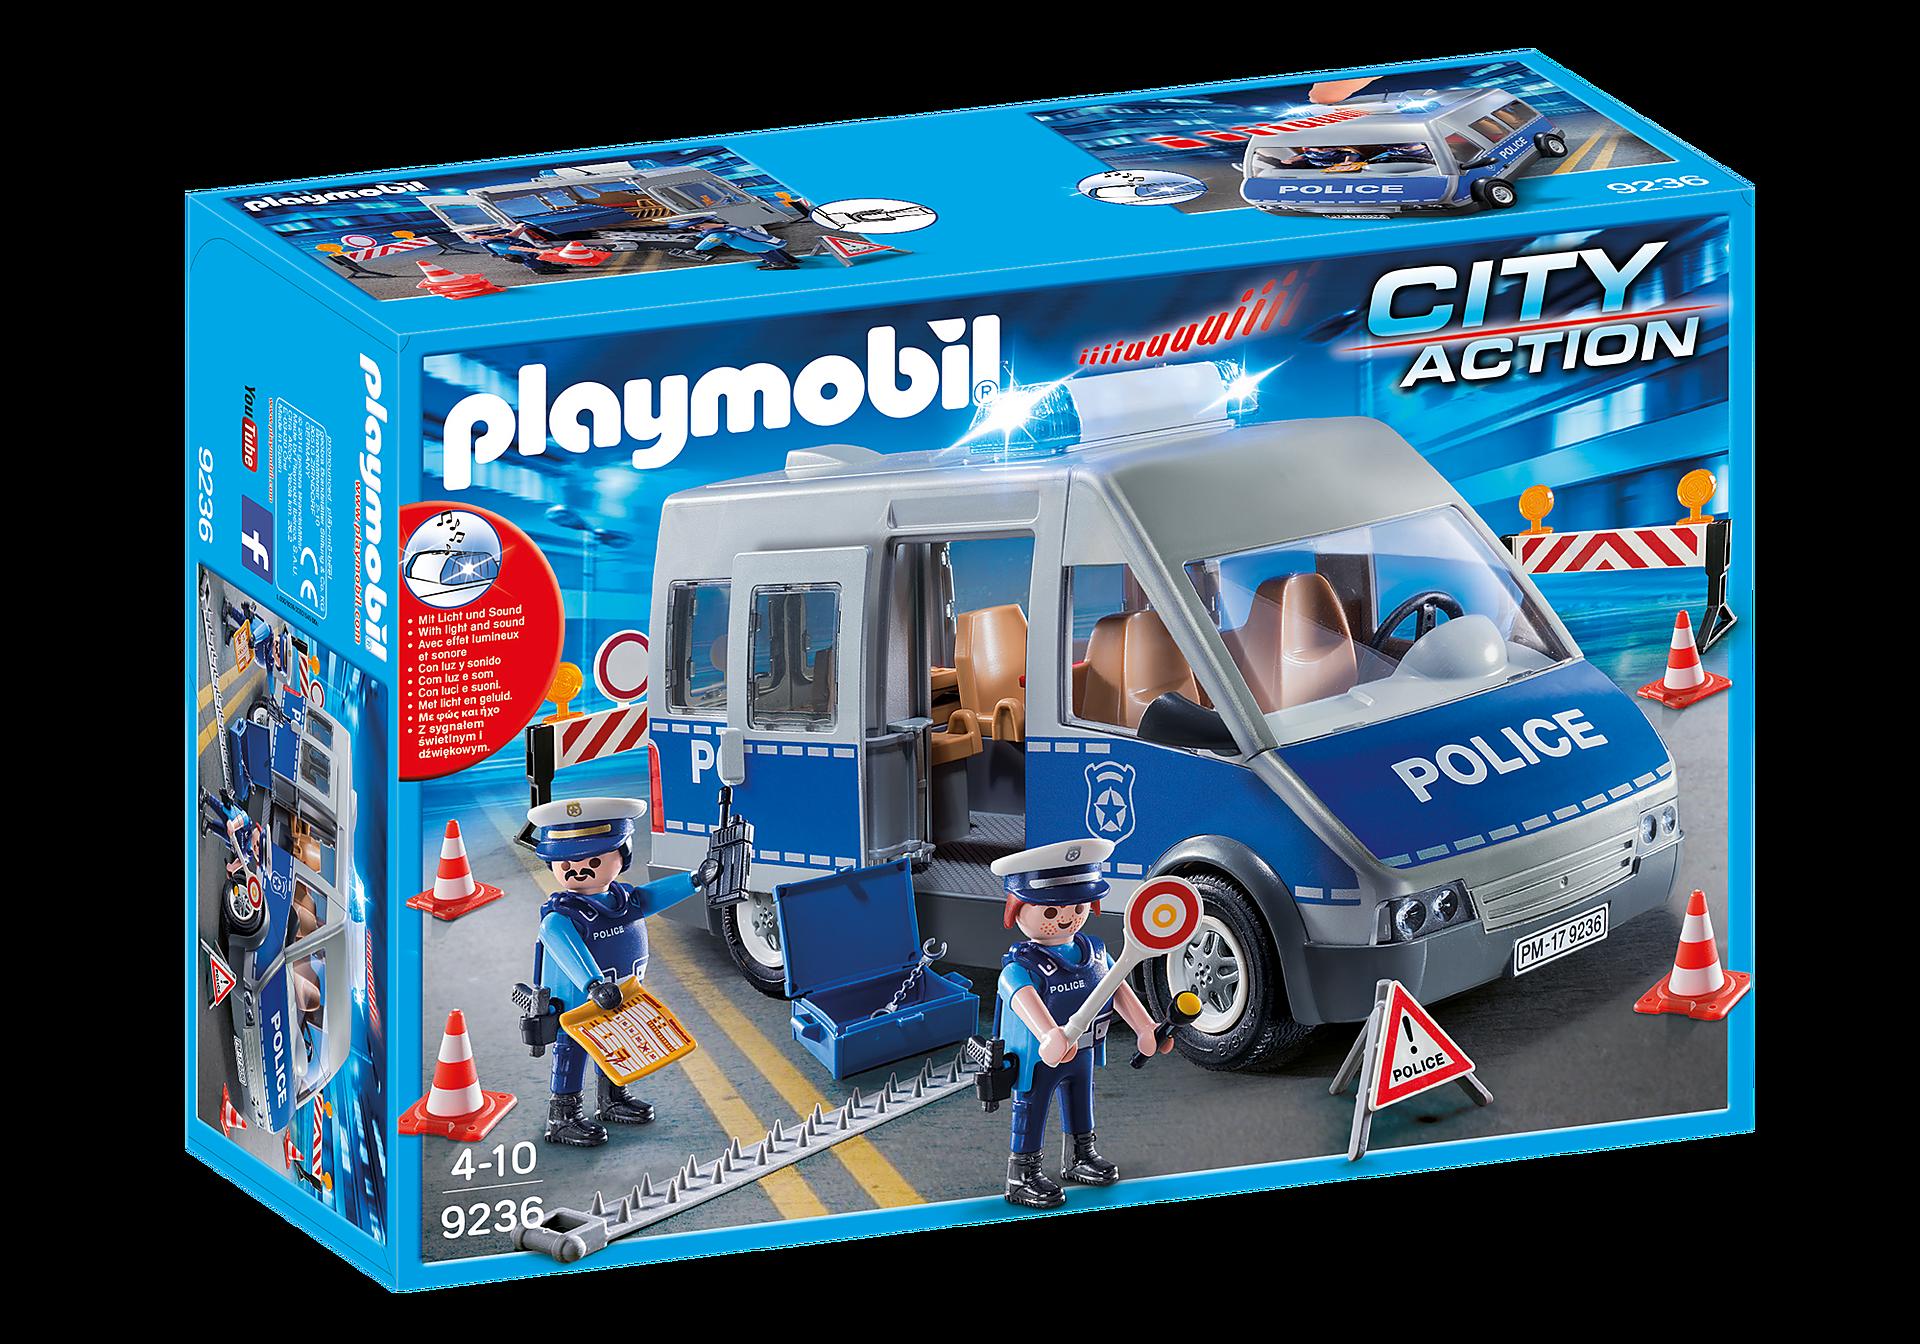 http://media.playmobil.com/i/playmobil/9236_product_box_front/Fourgon de policiers avec matériel de barrage